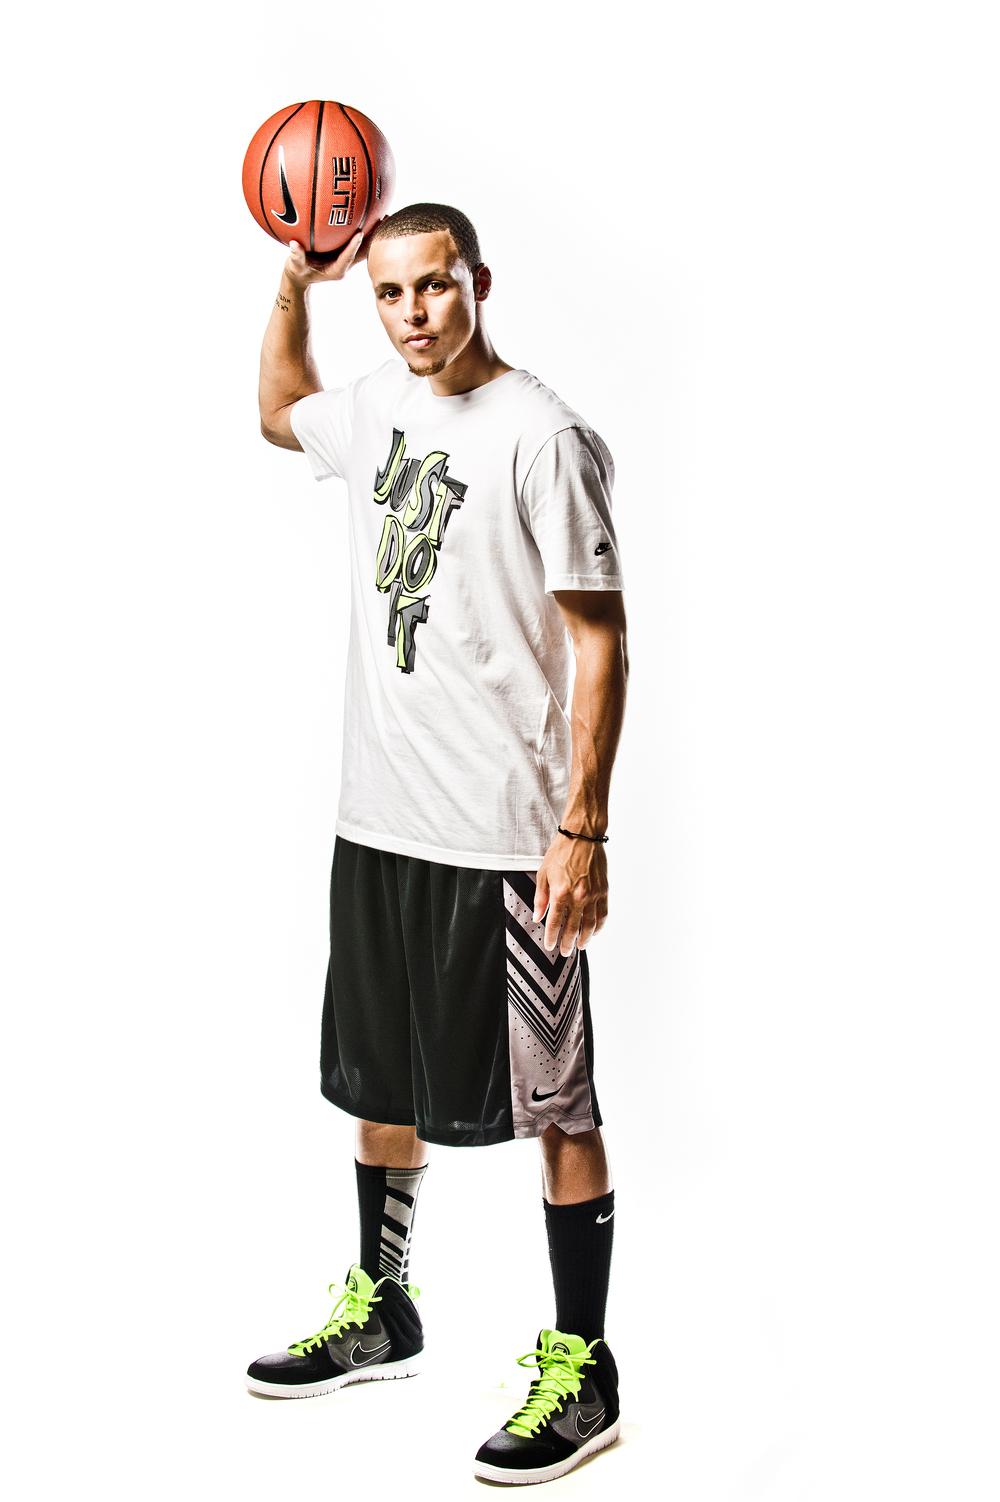 Steph Curry-9383.jpg